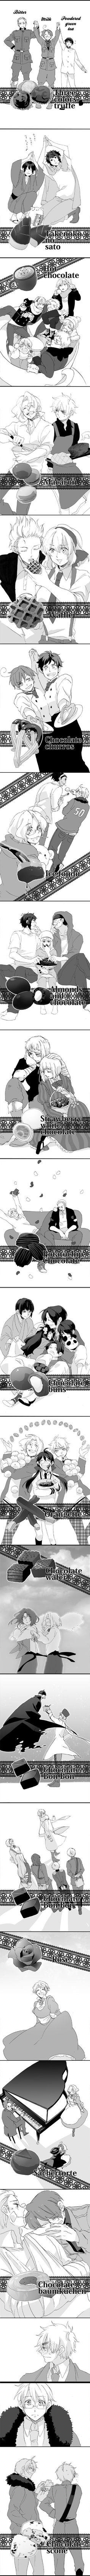 Tags: Anime, Chocolate, Axis Powers: Hetalia, Taiwan, Japan, Liechtenstein, Switzerland